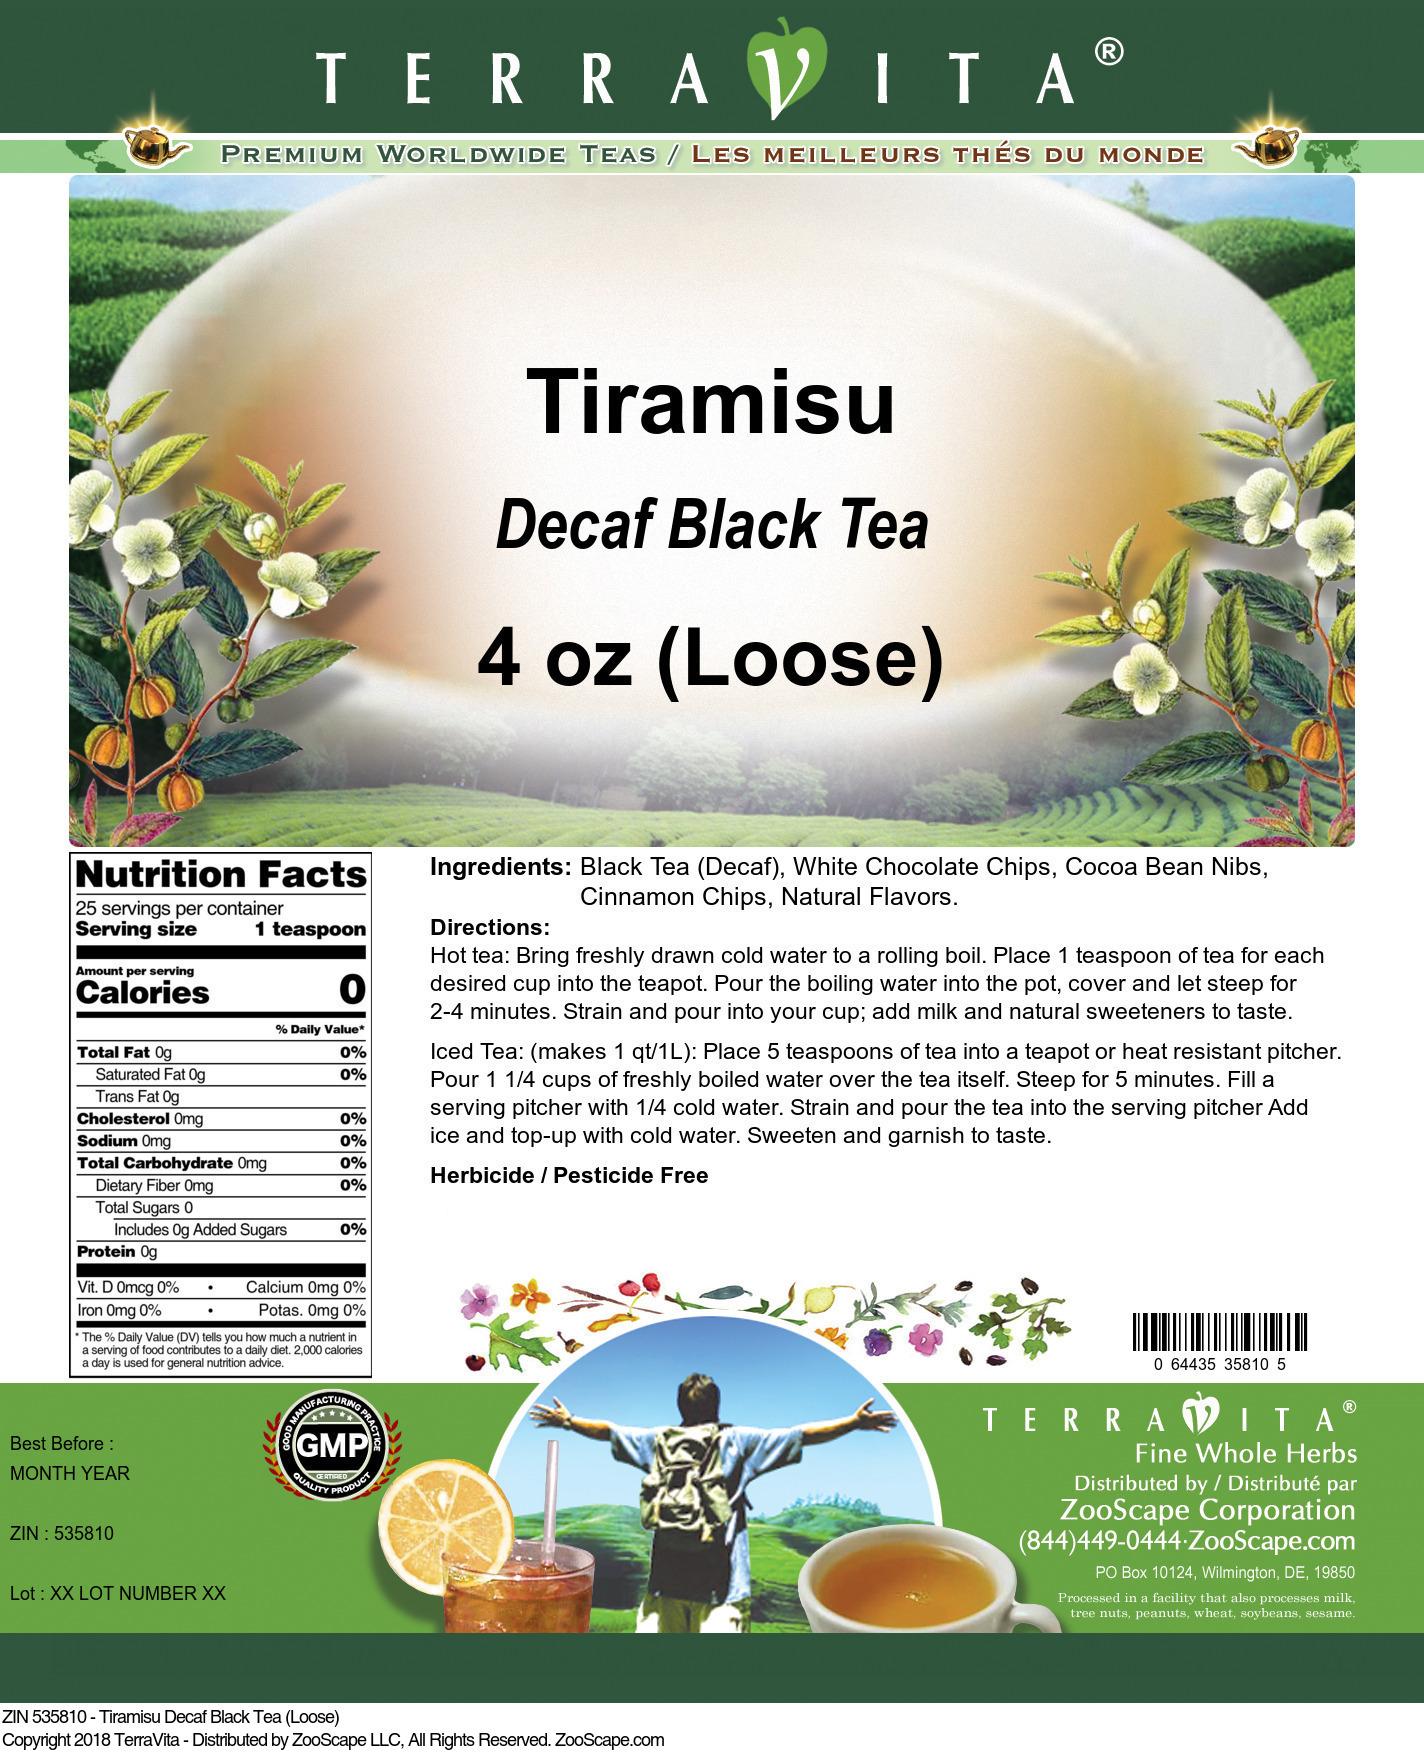 Tiramisu Decaf Black Tea (Loose)